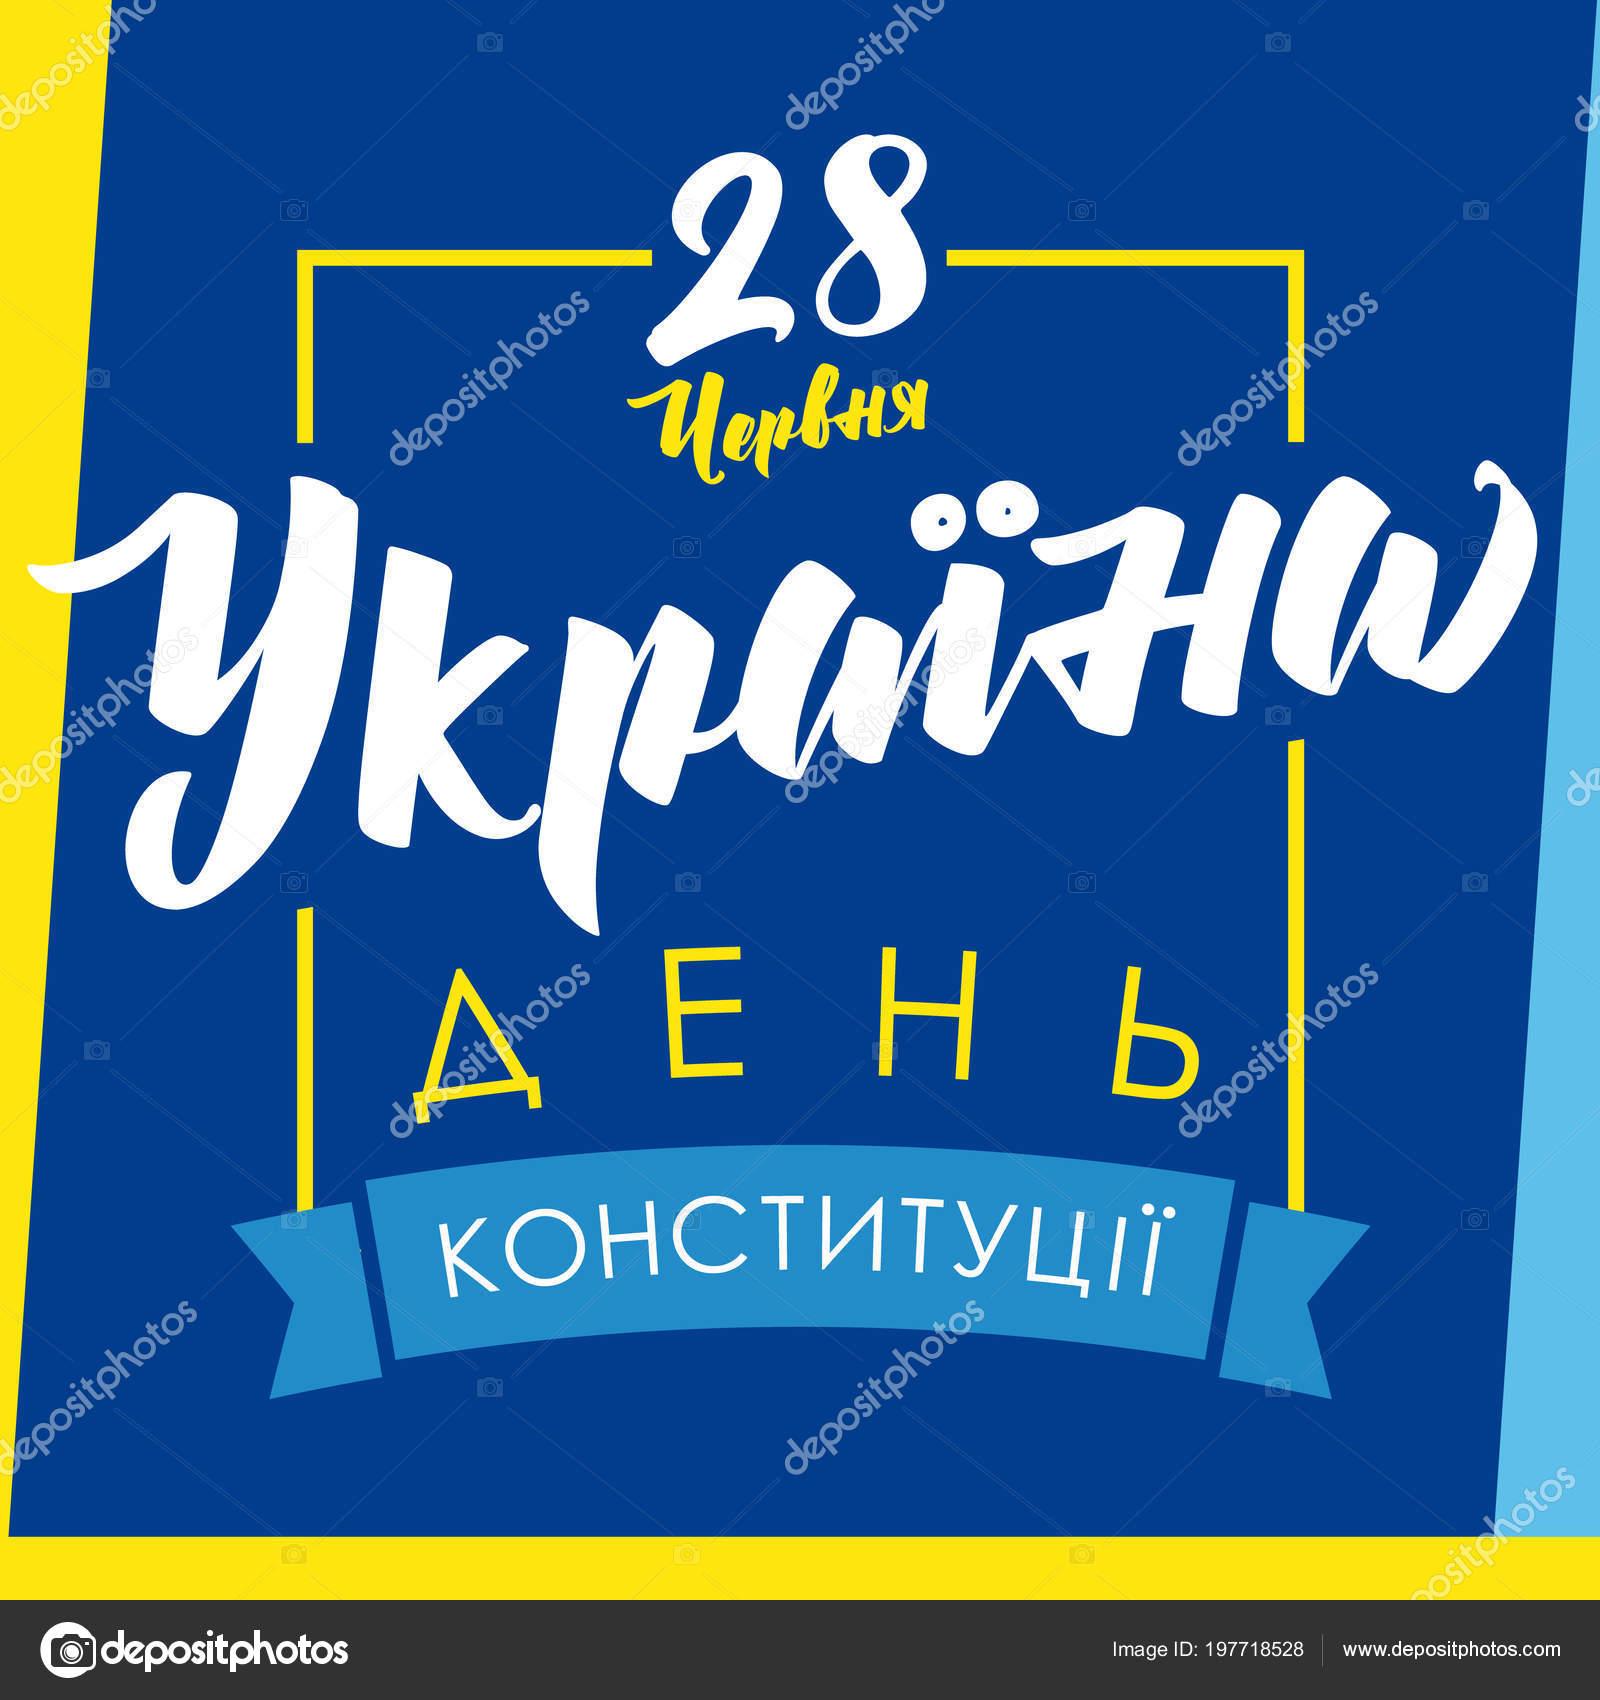 Constitution Day Ukraine Greetings Card Ukrainian Text National